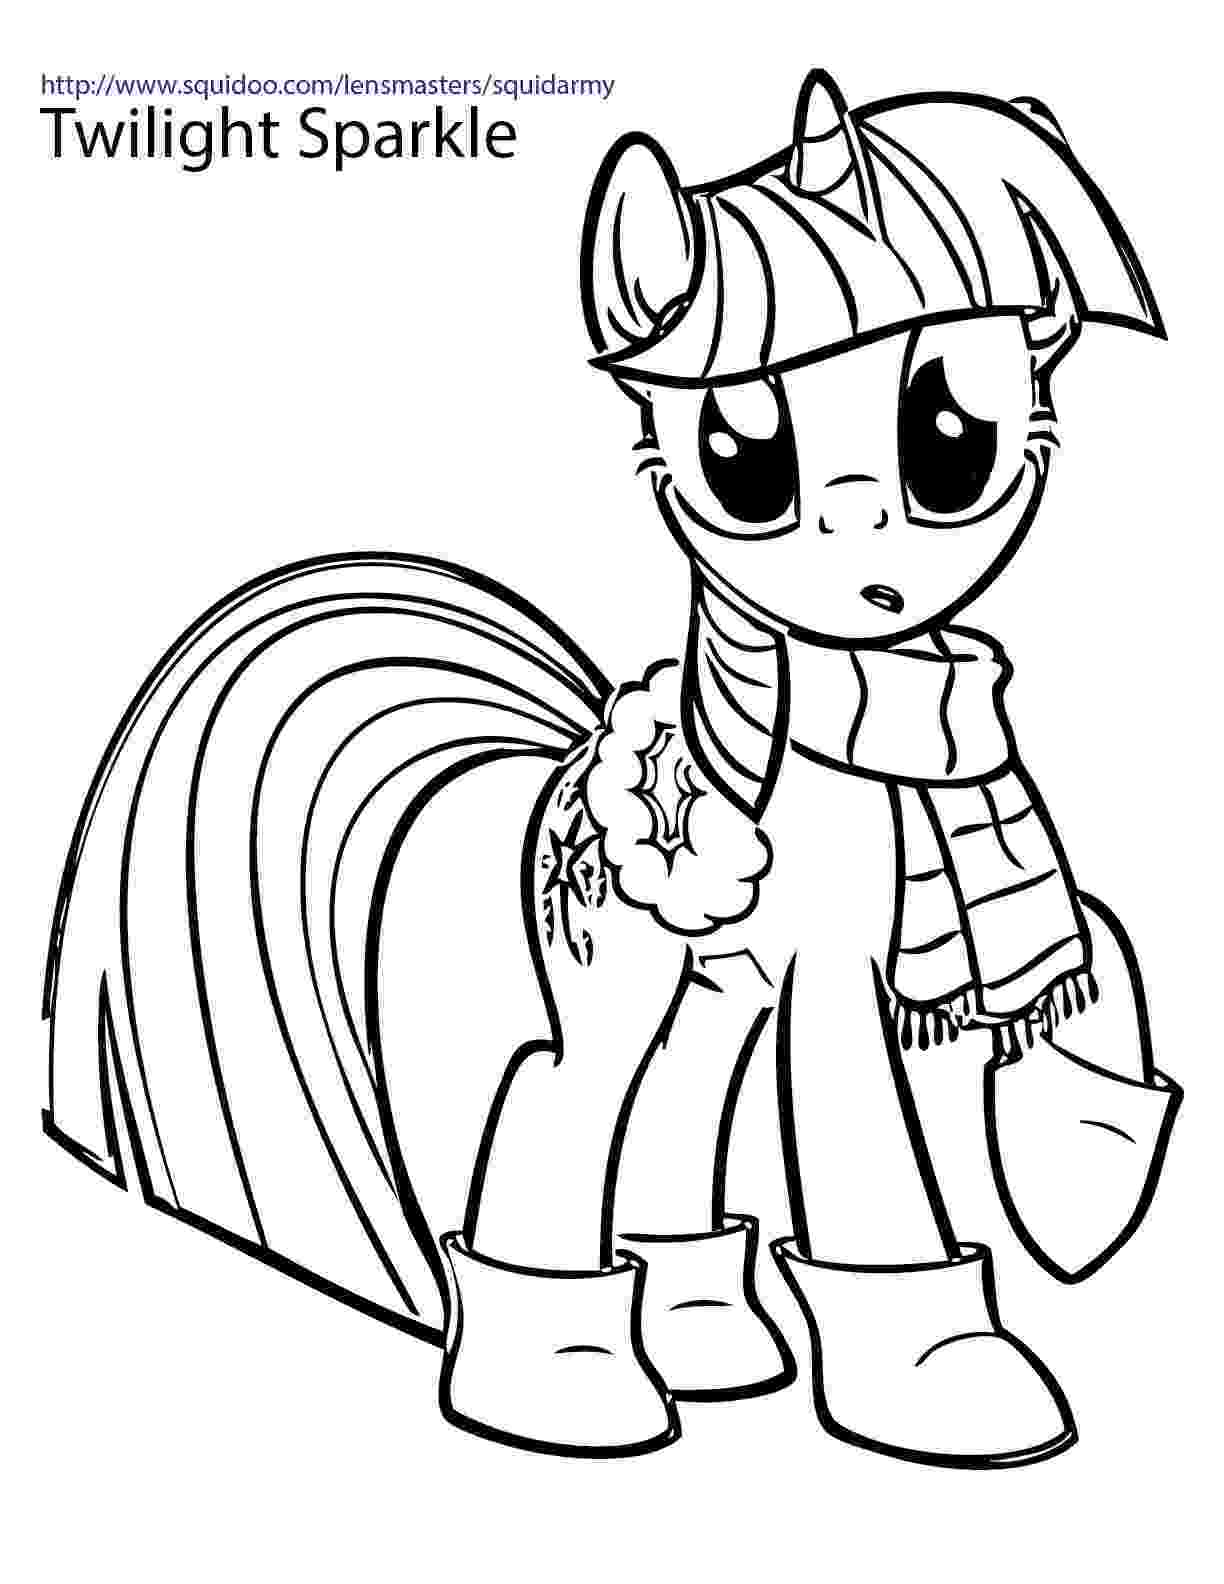 twilight sparkle coloring my little pony twilight sparkle and spike coloring page twilight coloring sparkle